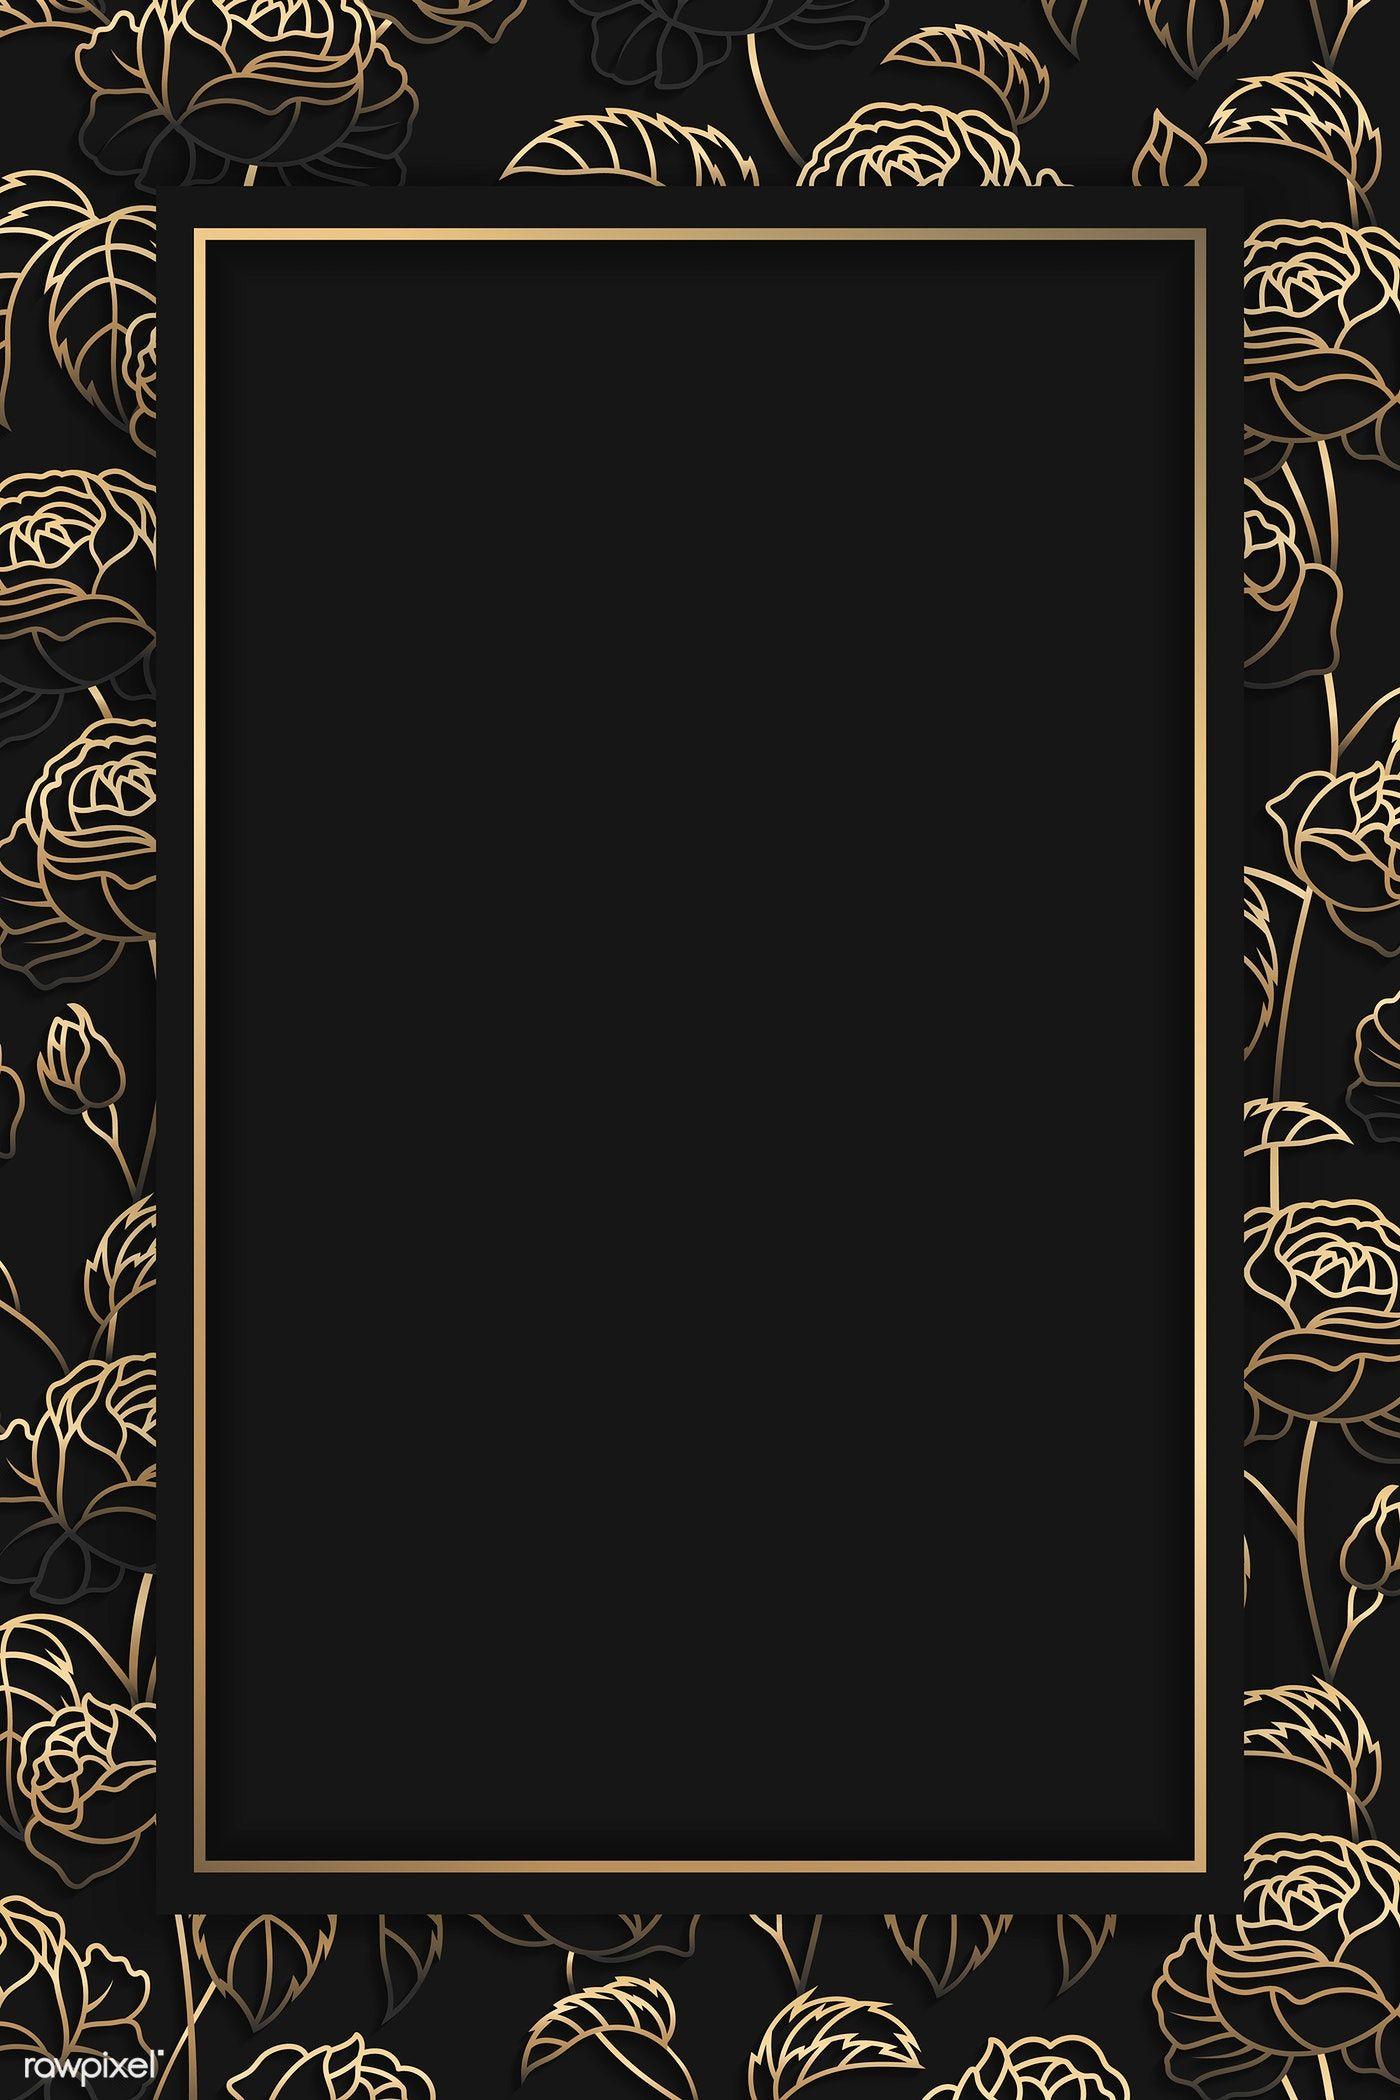 Download Premium Vector Of Rectangle Gold Frame On Gold Floral Pattern On Gold Frame Black Background Wallpaper Photoshop Backgrounds Backdrops